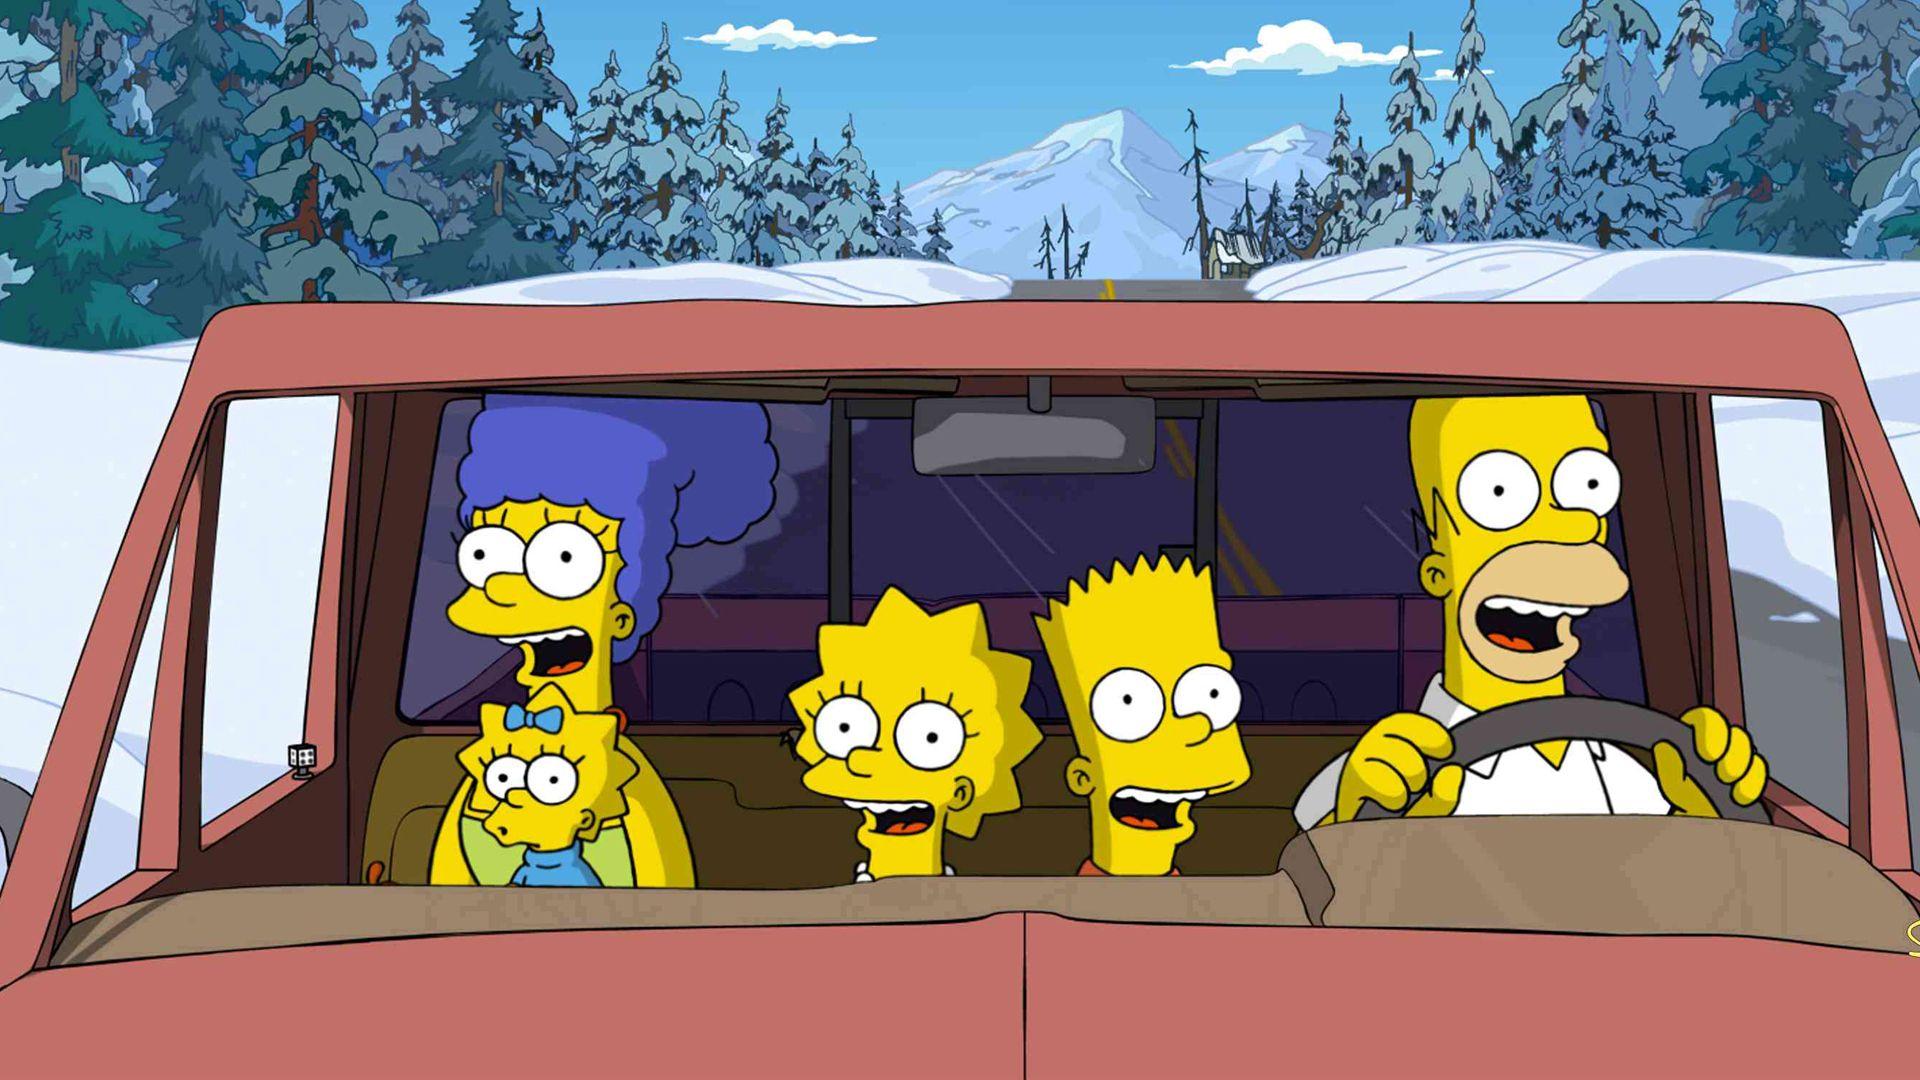 Simpsons Filme wallpaper   ForWallpapercom 1920x1080